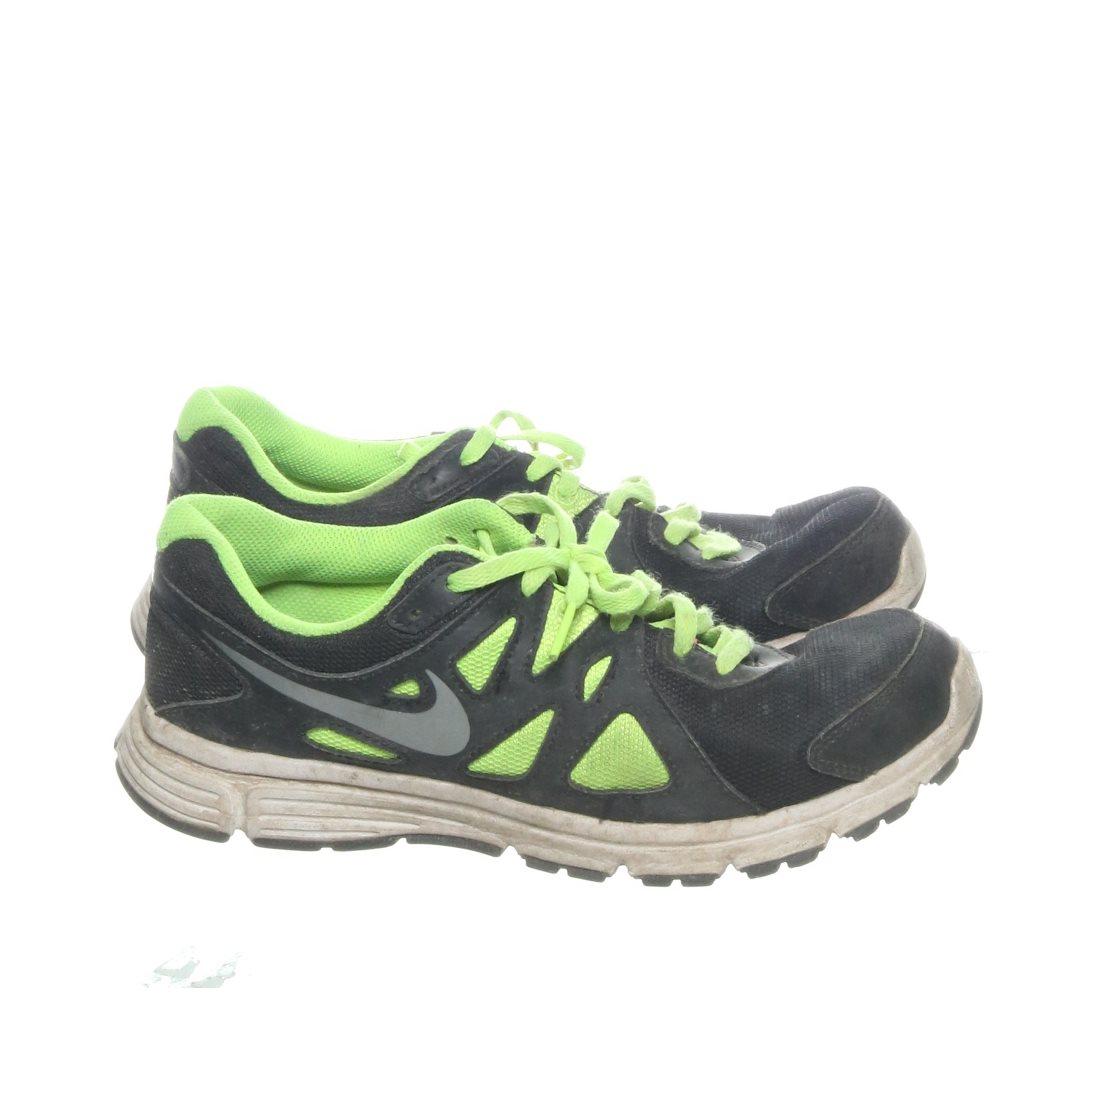 online store 615f6 ff226 ... official nike sneakers strl 375 svart gul d6c78 1de4f